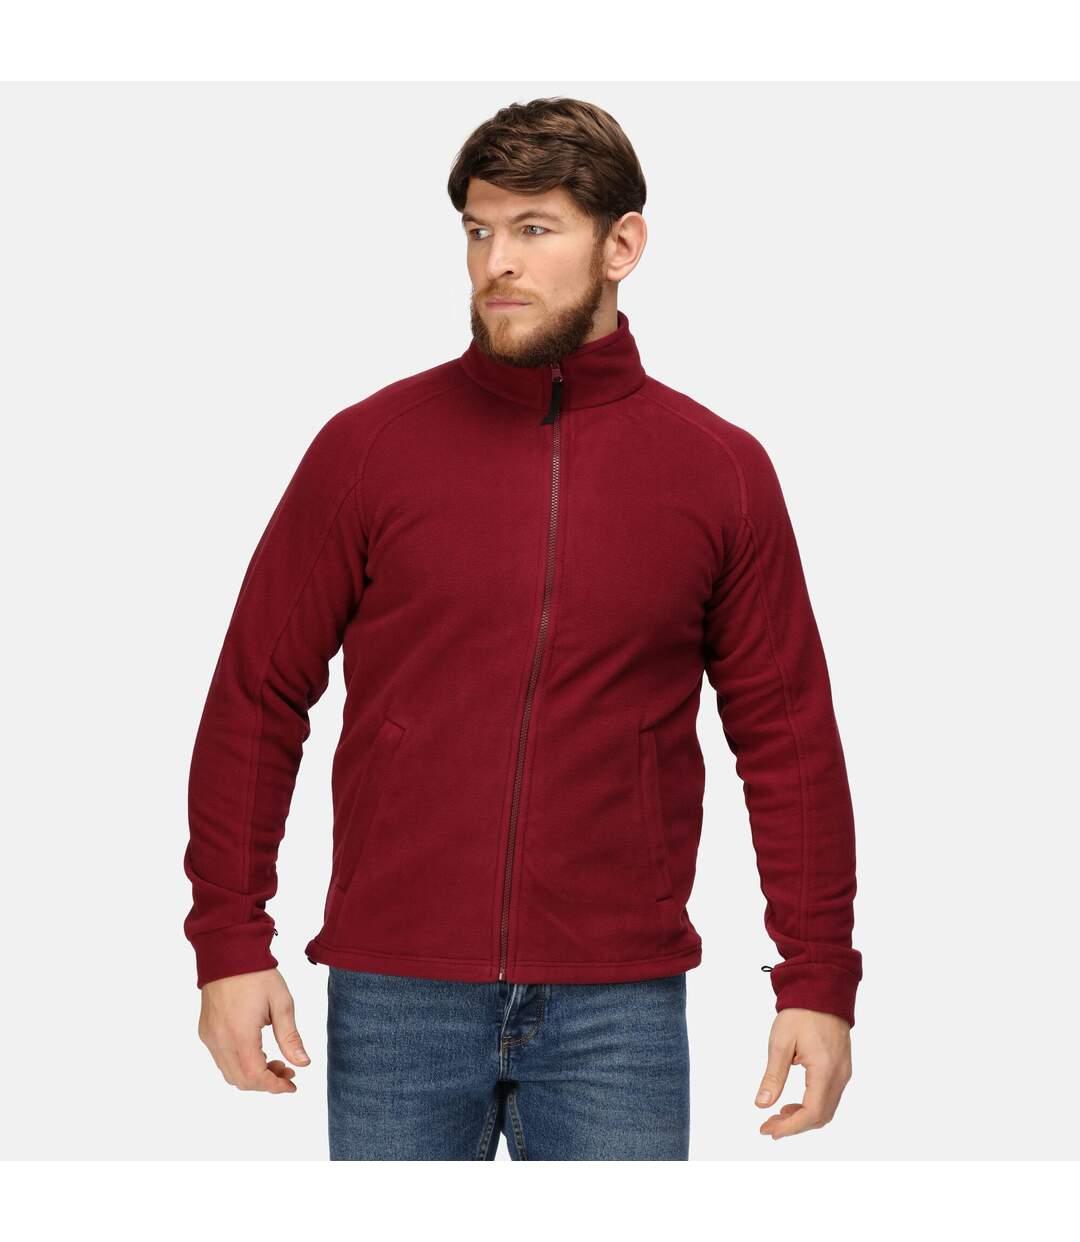 Regatta Mens Thor III Fleece Jacket (Bordeaux) - UTRG1486